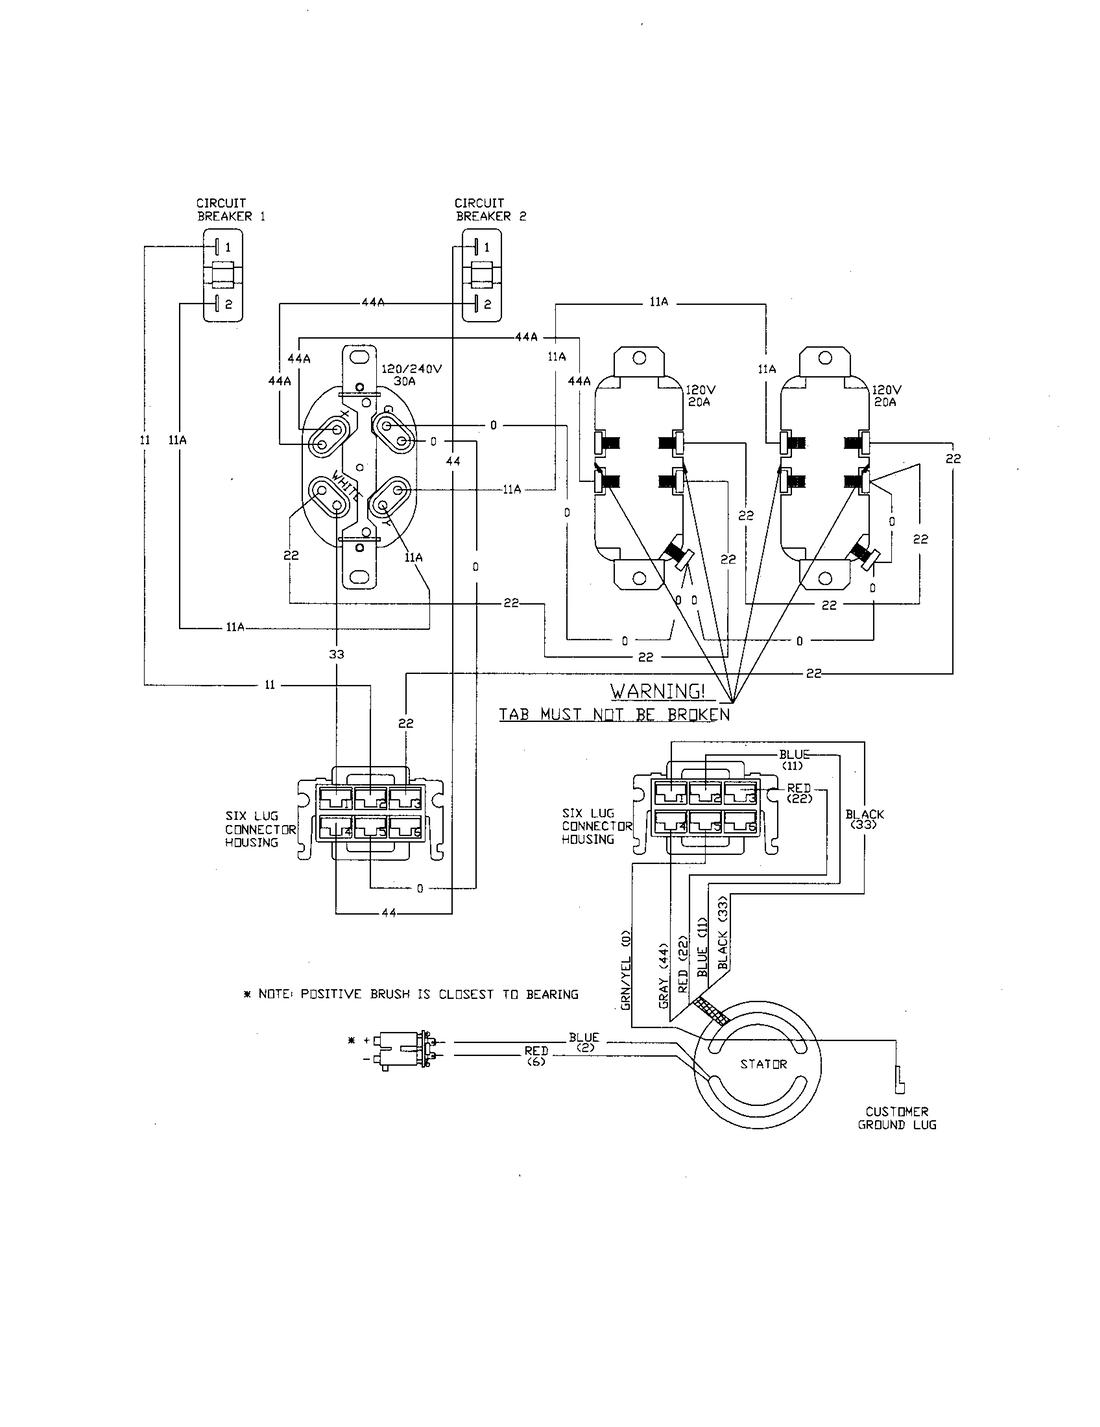 ac wiring diagramsfortmaker